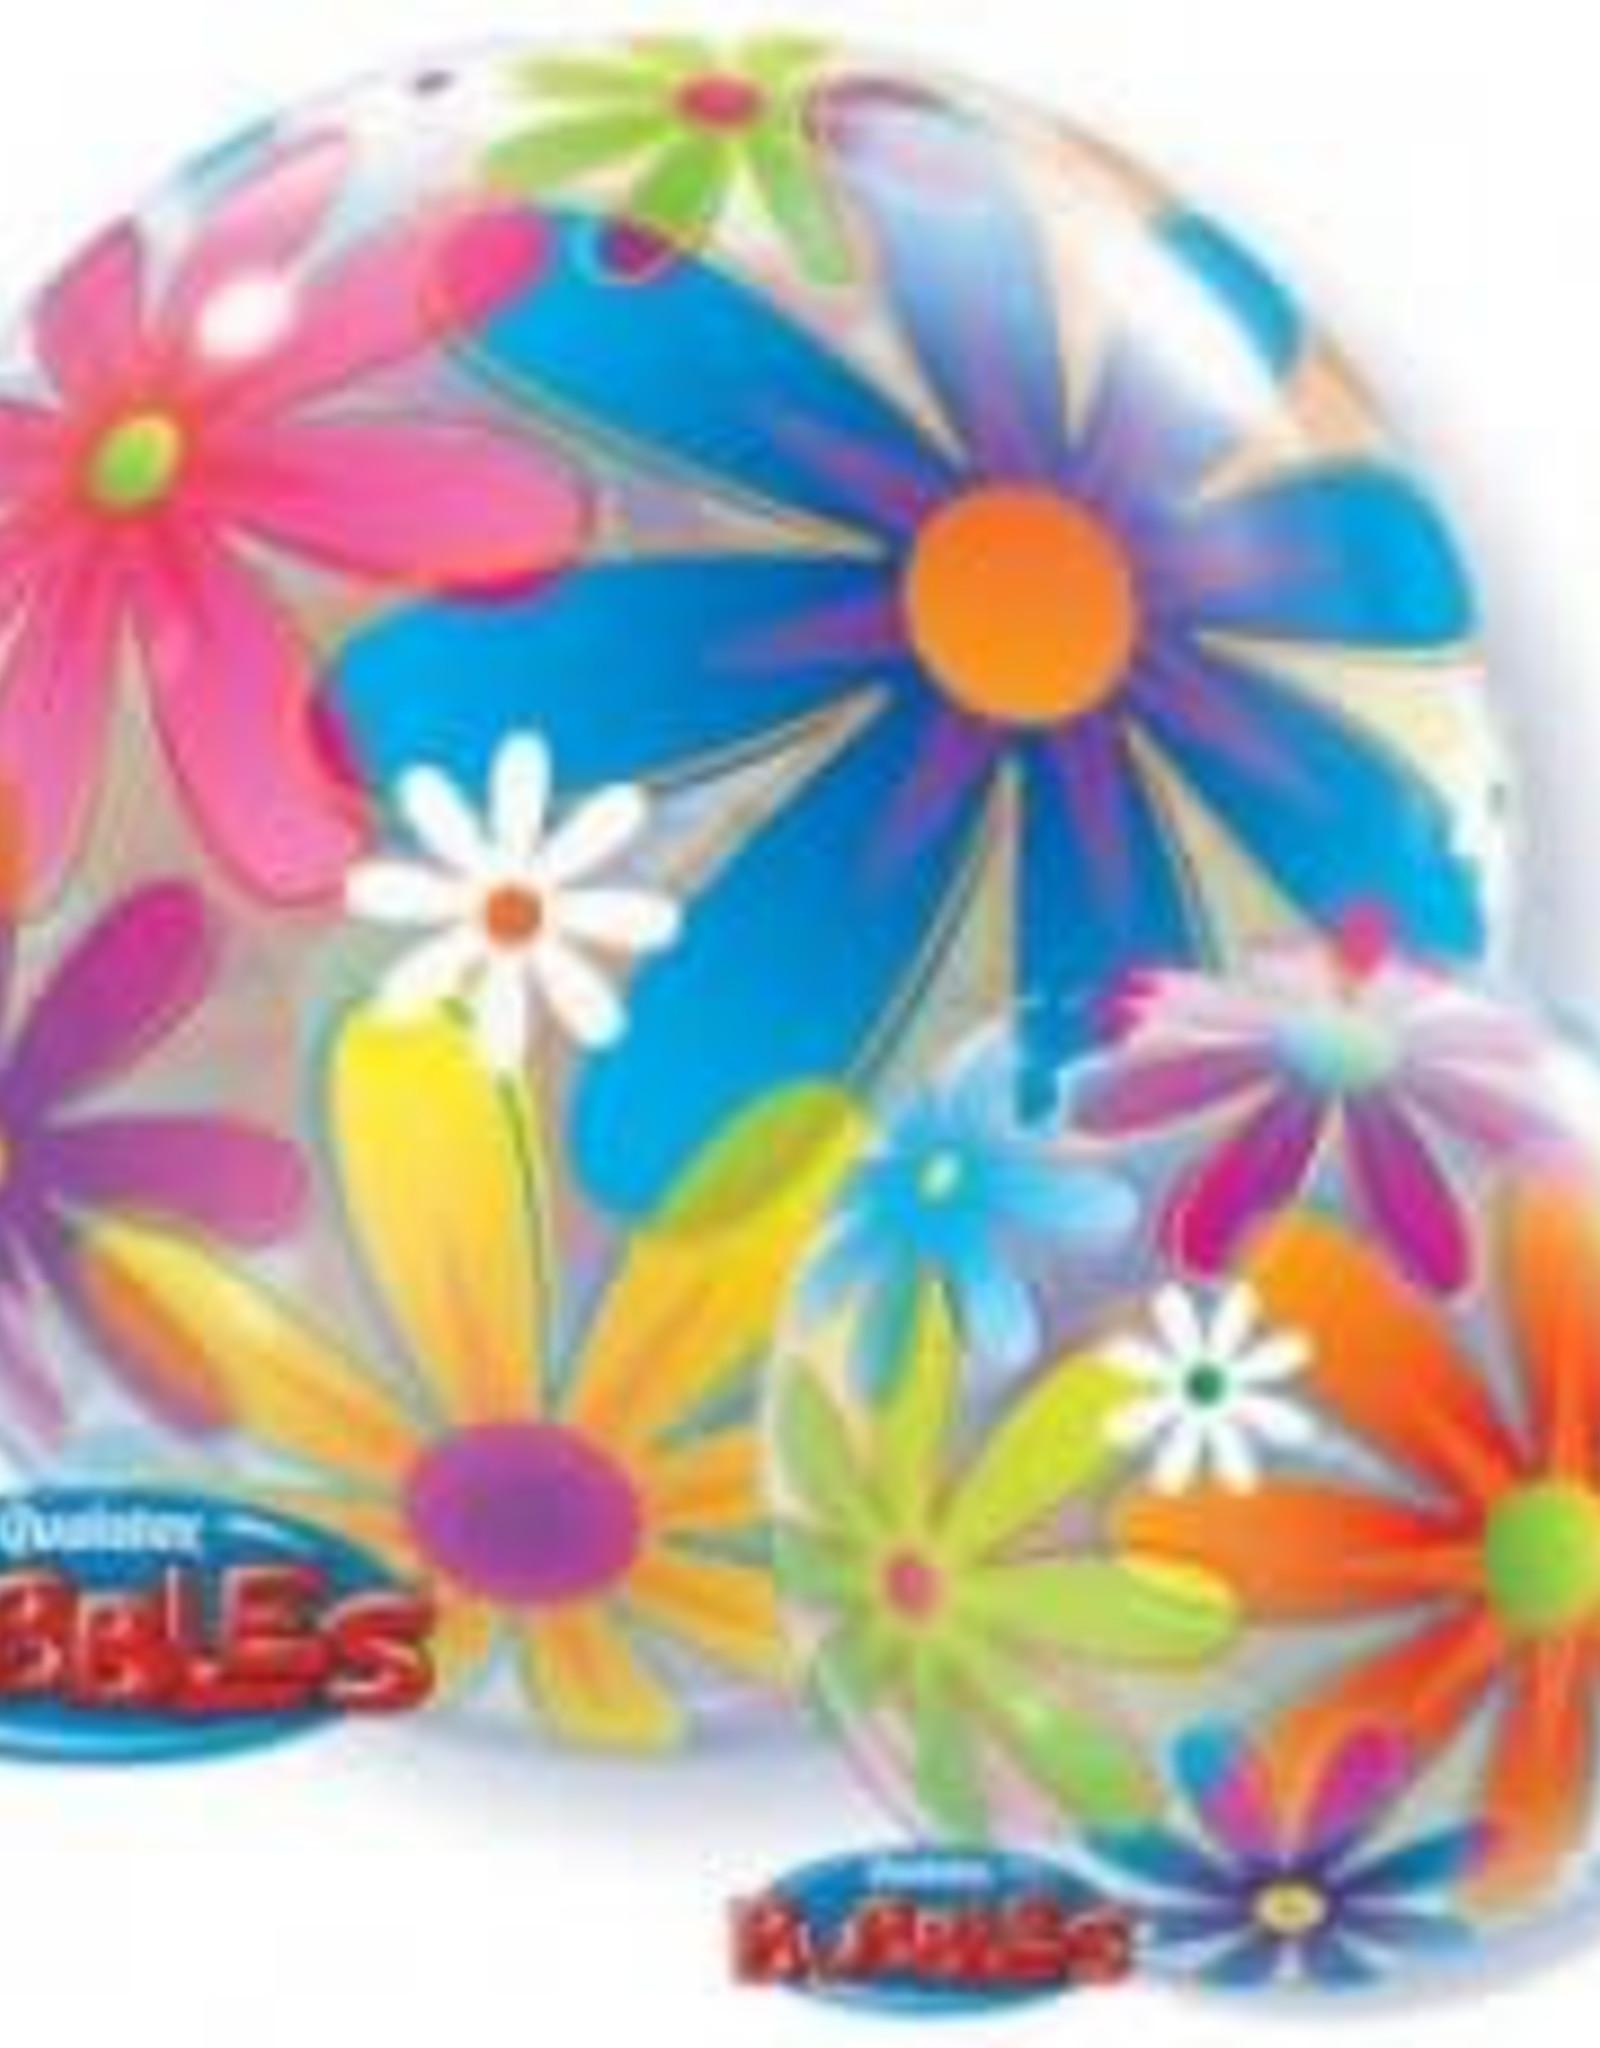 Sempertex avalloons bubbles balloon bloemen